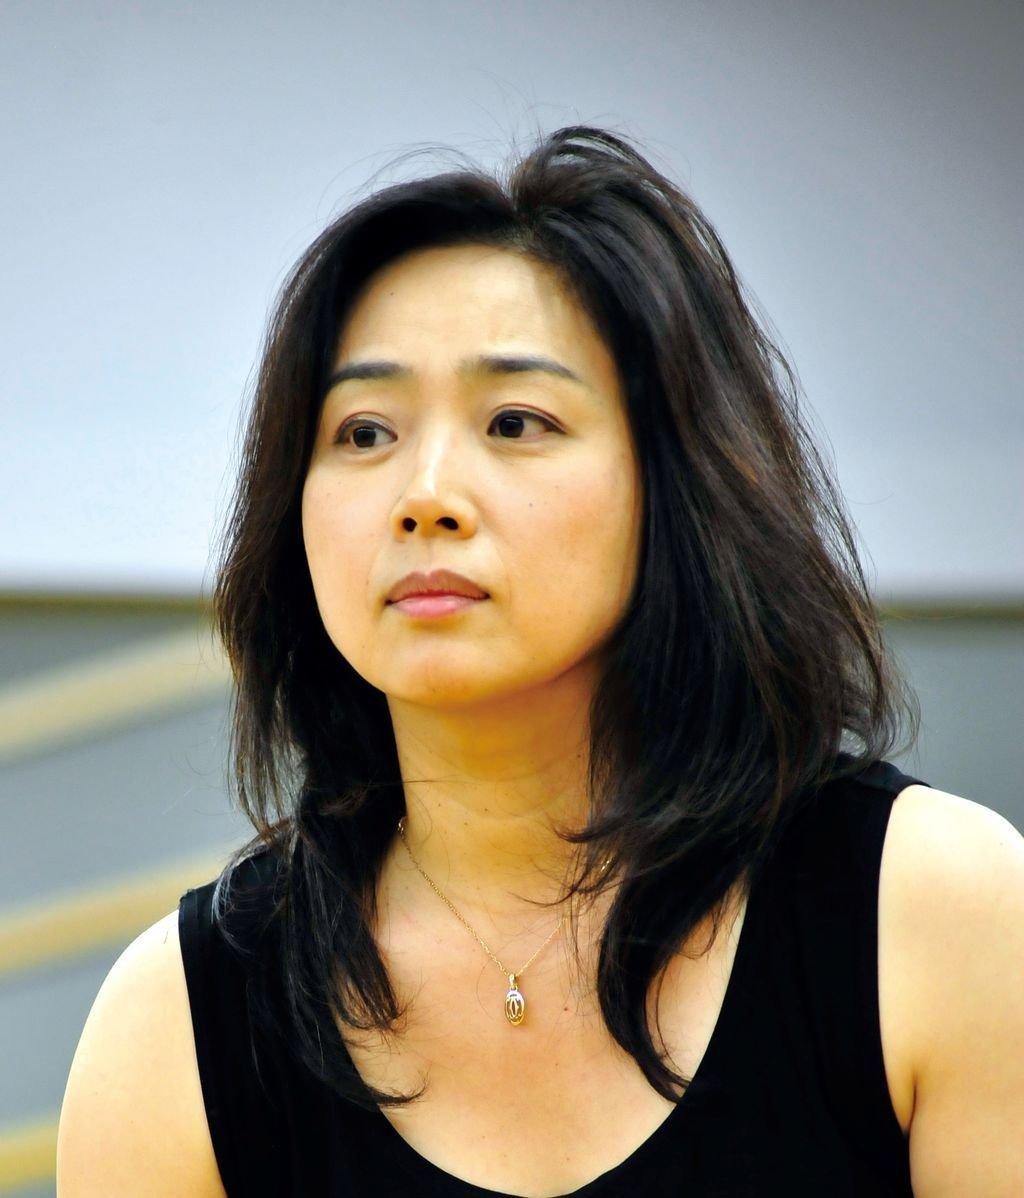 introducing kumiko fujiyoshi14.jpg?resize=1200,630 - 藤吉久美子の魅力と現在の活動をご紹介!